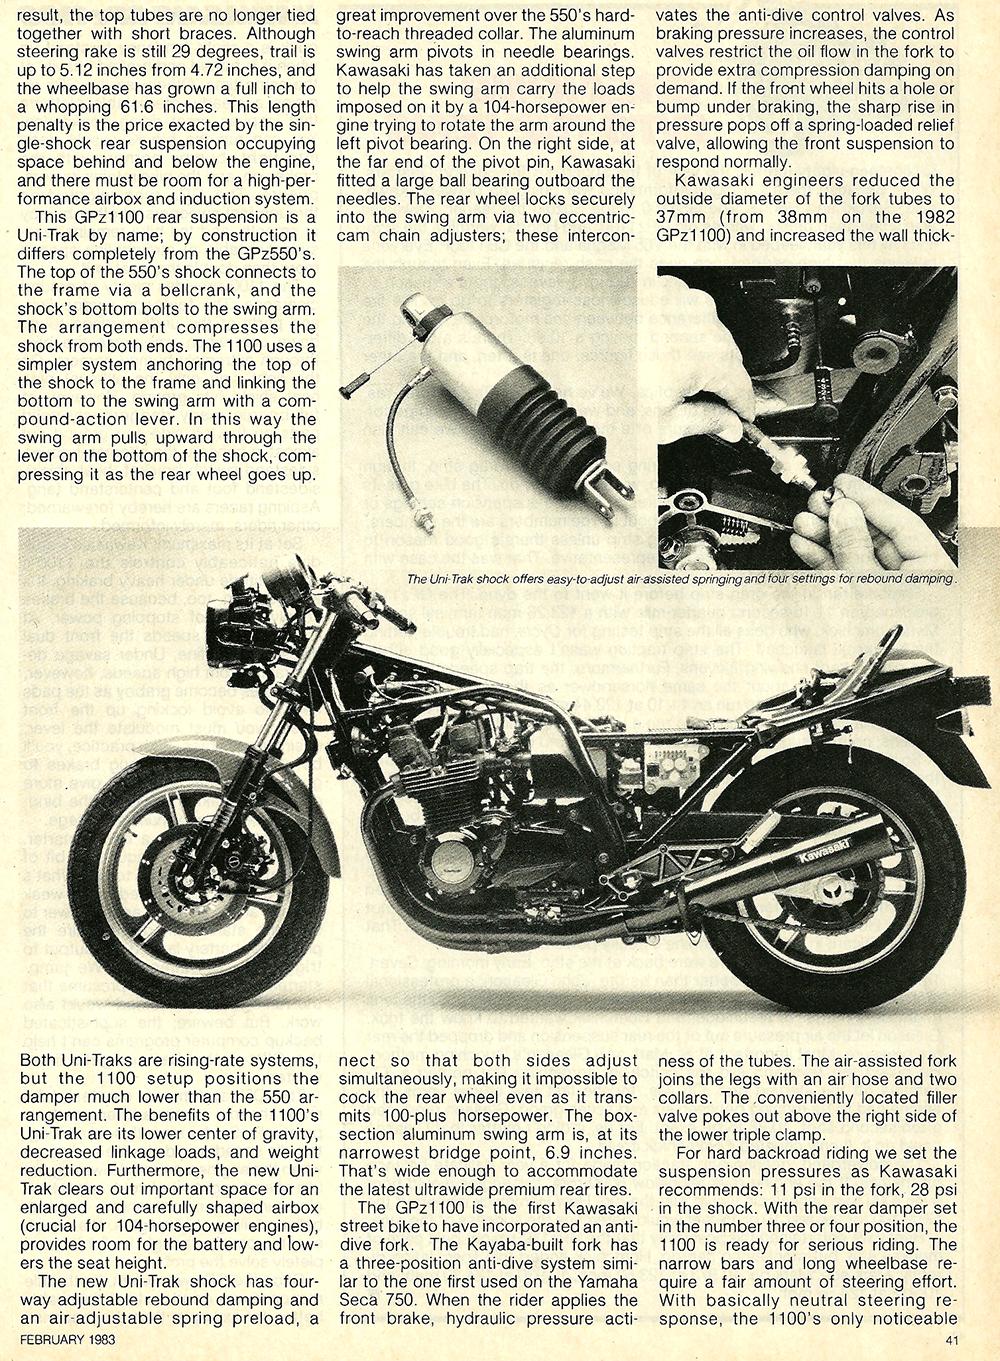 1983 Kawasaki GPz1100 road test 6.jpg